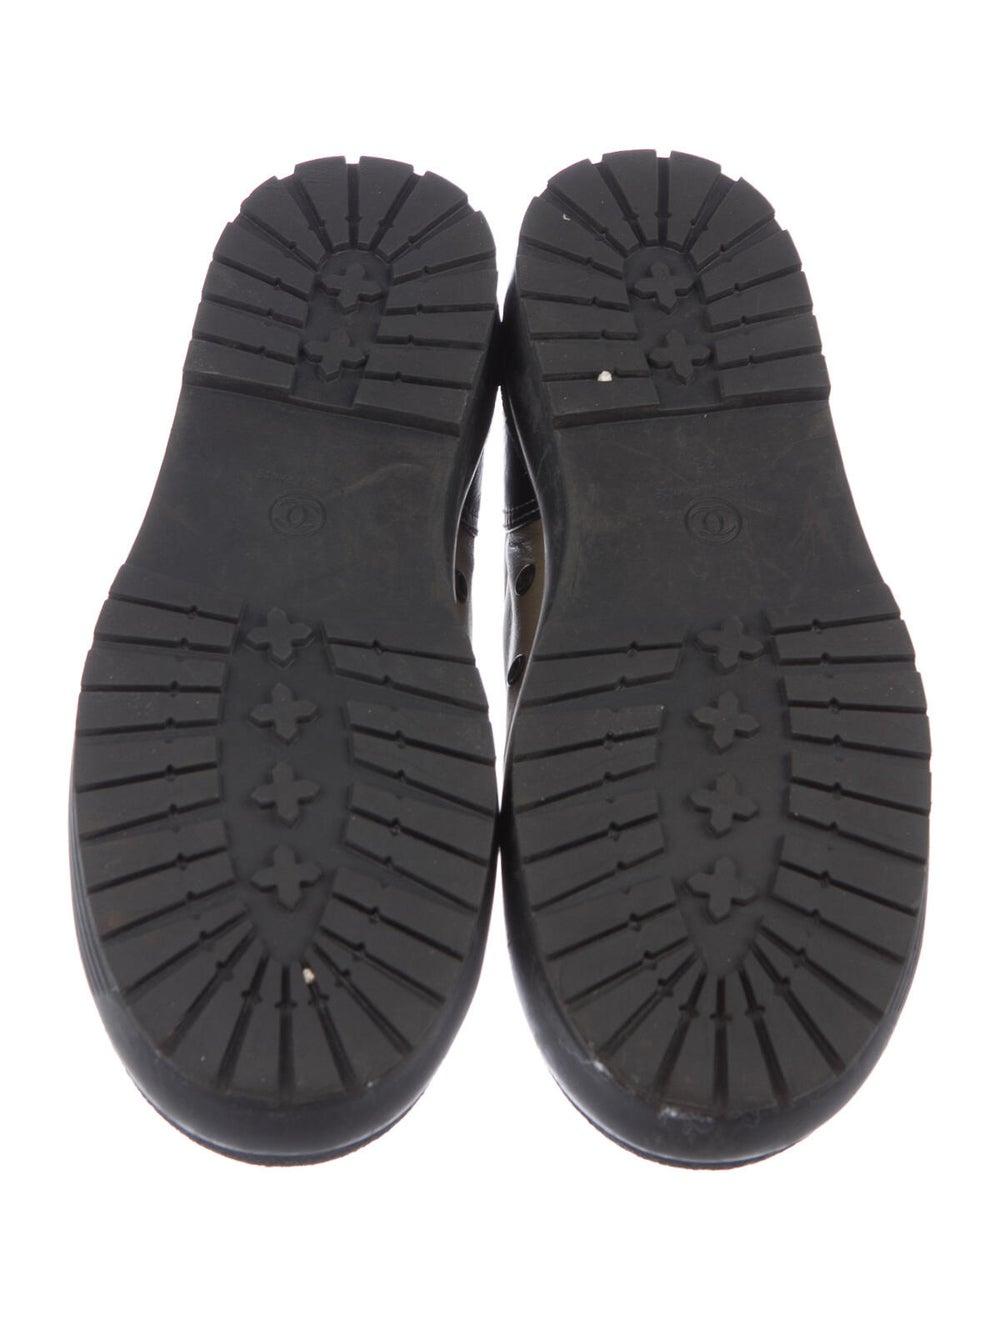 Chanel Interlocking CC Logo Leather Sneakers - image 5